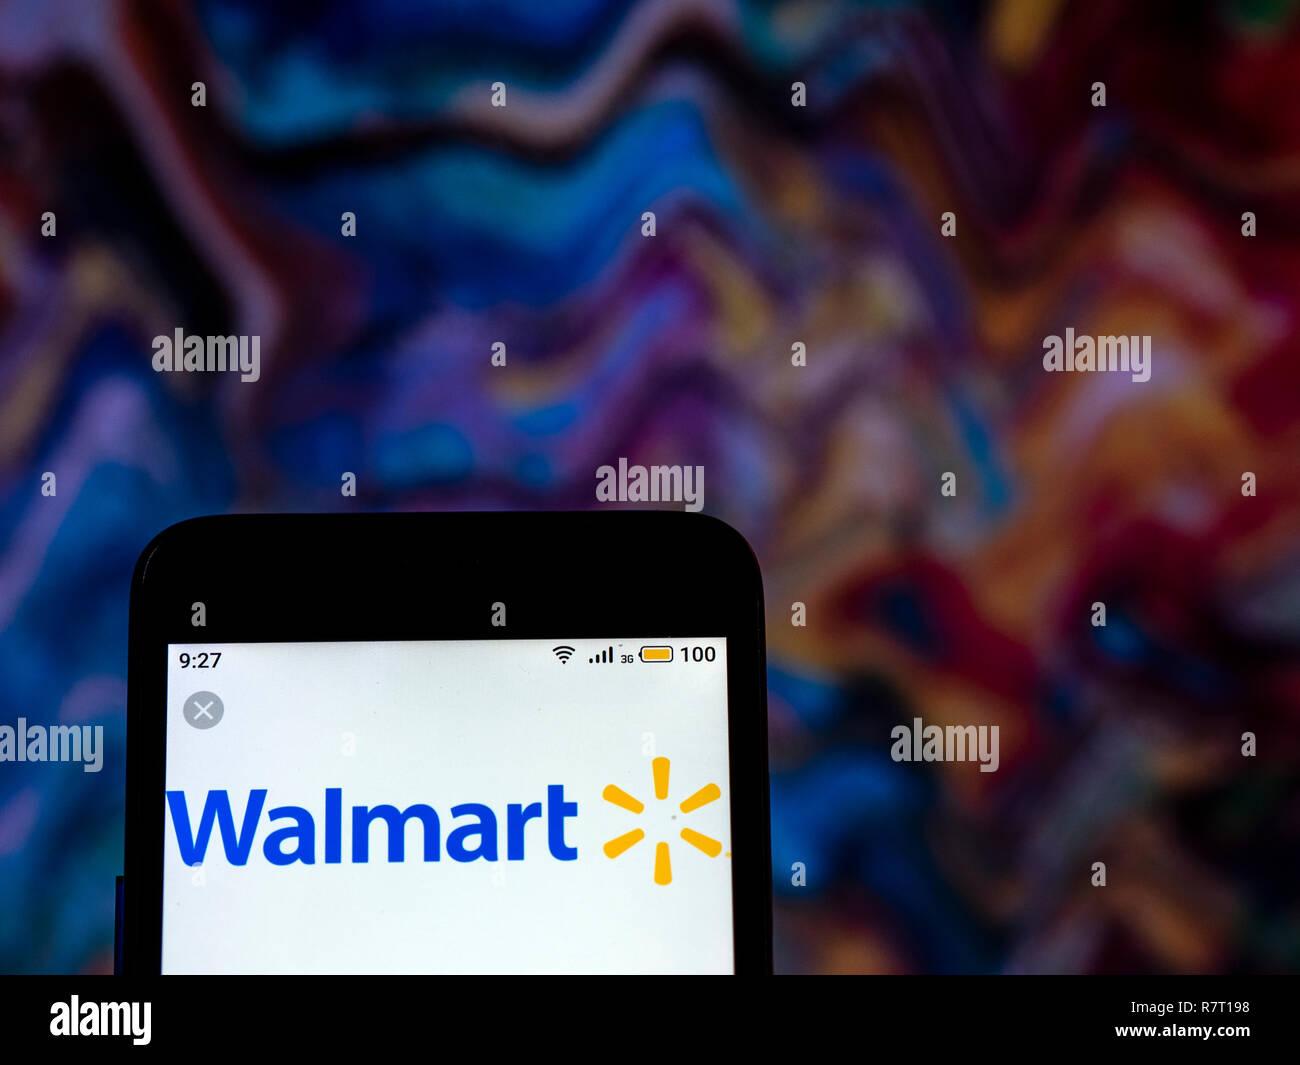 Walmart Stock Phone Number >> Walmart Logo Seen Displayed On Smart Phone Stock Photo 228565268